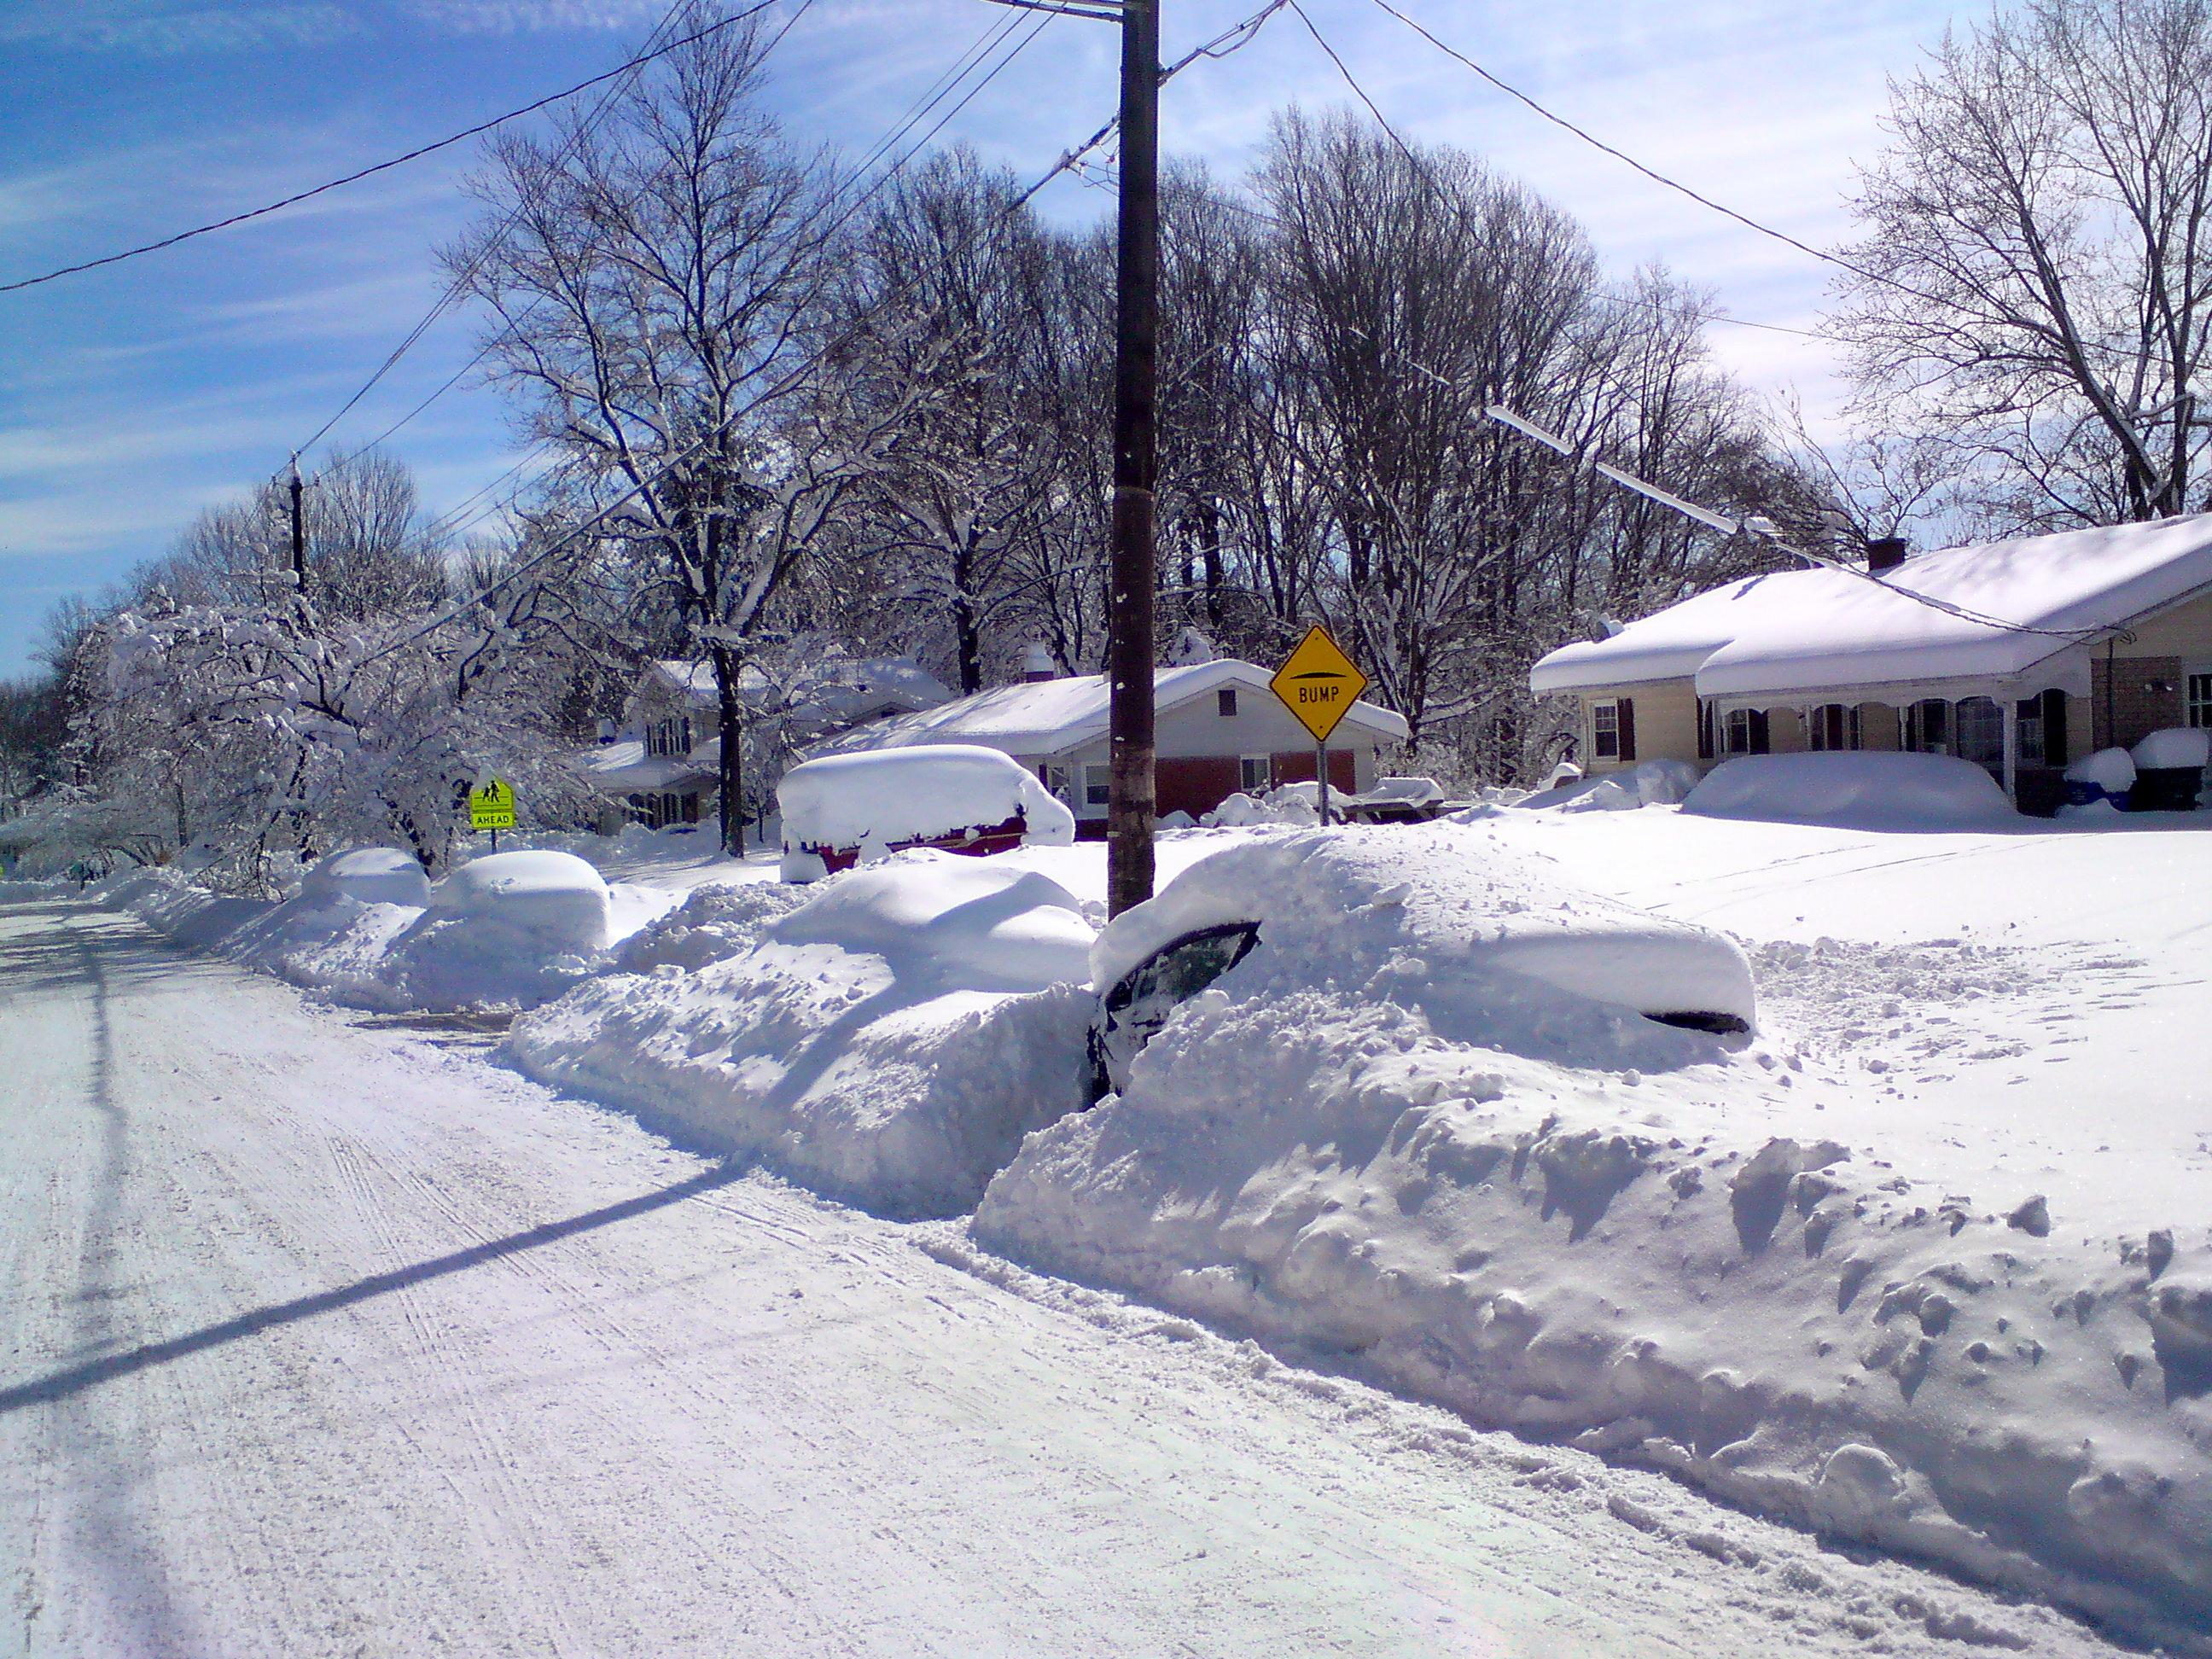 File:Snow-in-Maryland-Feb-09.JPG